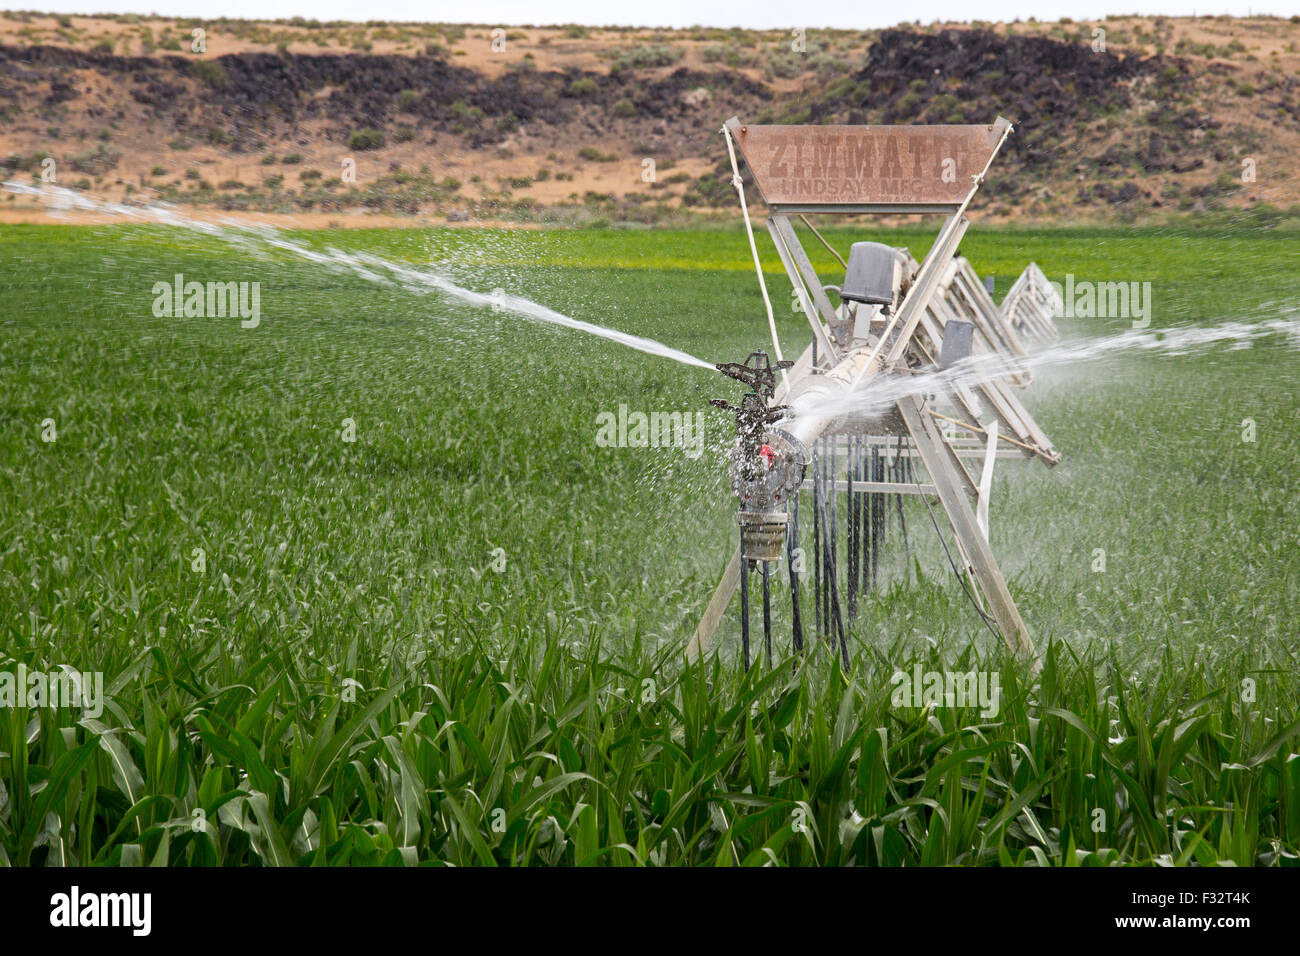 Raft River, Idaho - Irrigation of a corn crop. - Stock Image